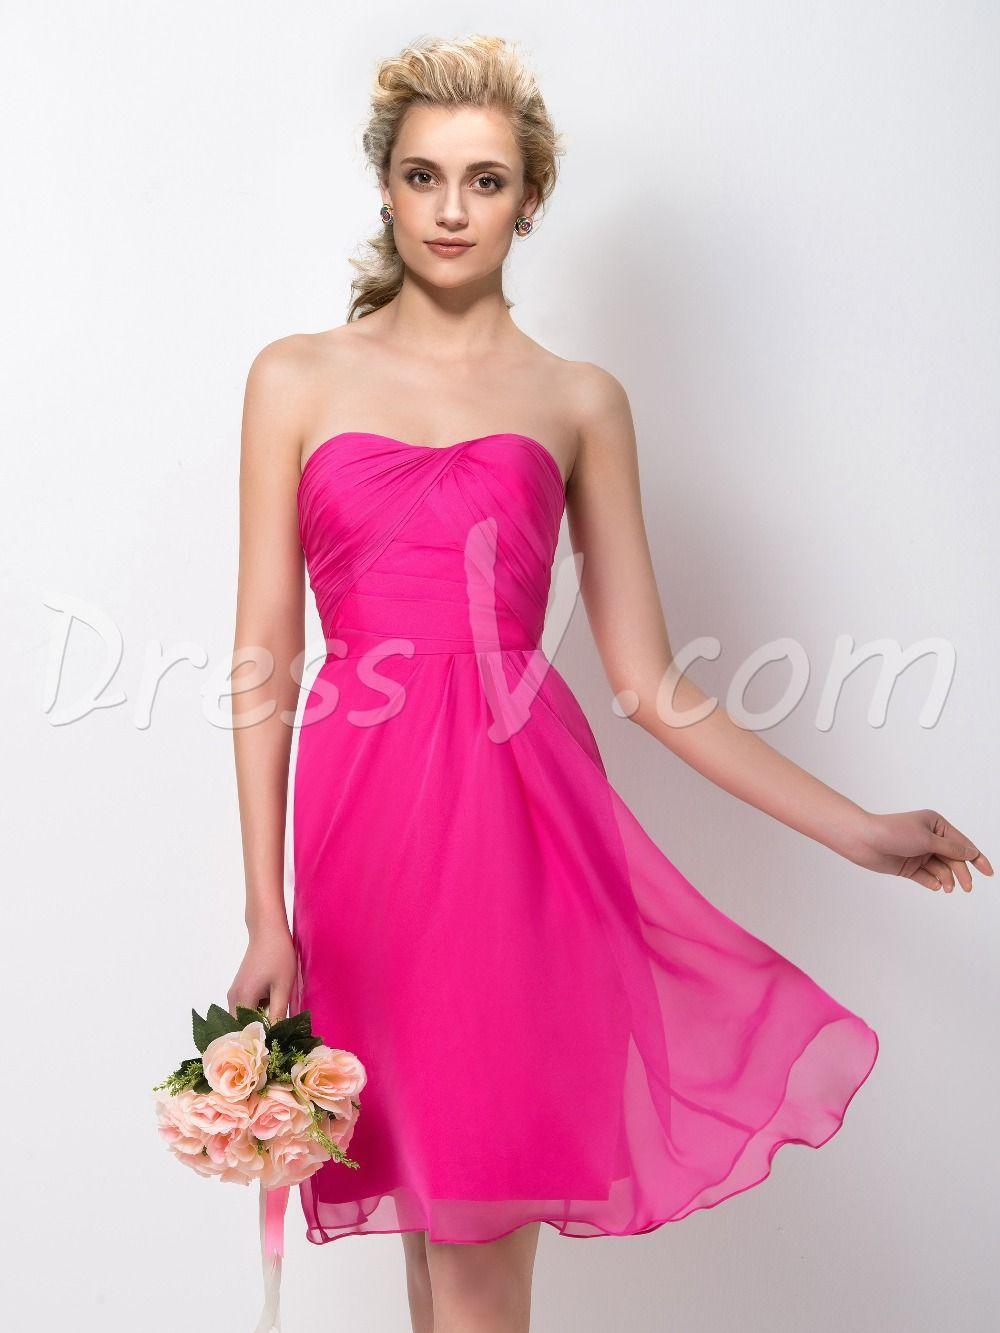 Cheap short bridesmaid dresses 2016 hot pink sweetheart a line cheap short bridesmaid dresses 2016 hot pink sweetheart a line ruched wedding maid of honor ombrellifo Gallery